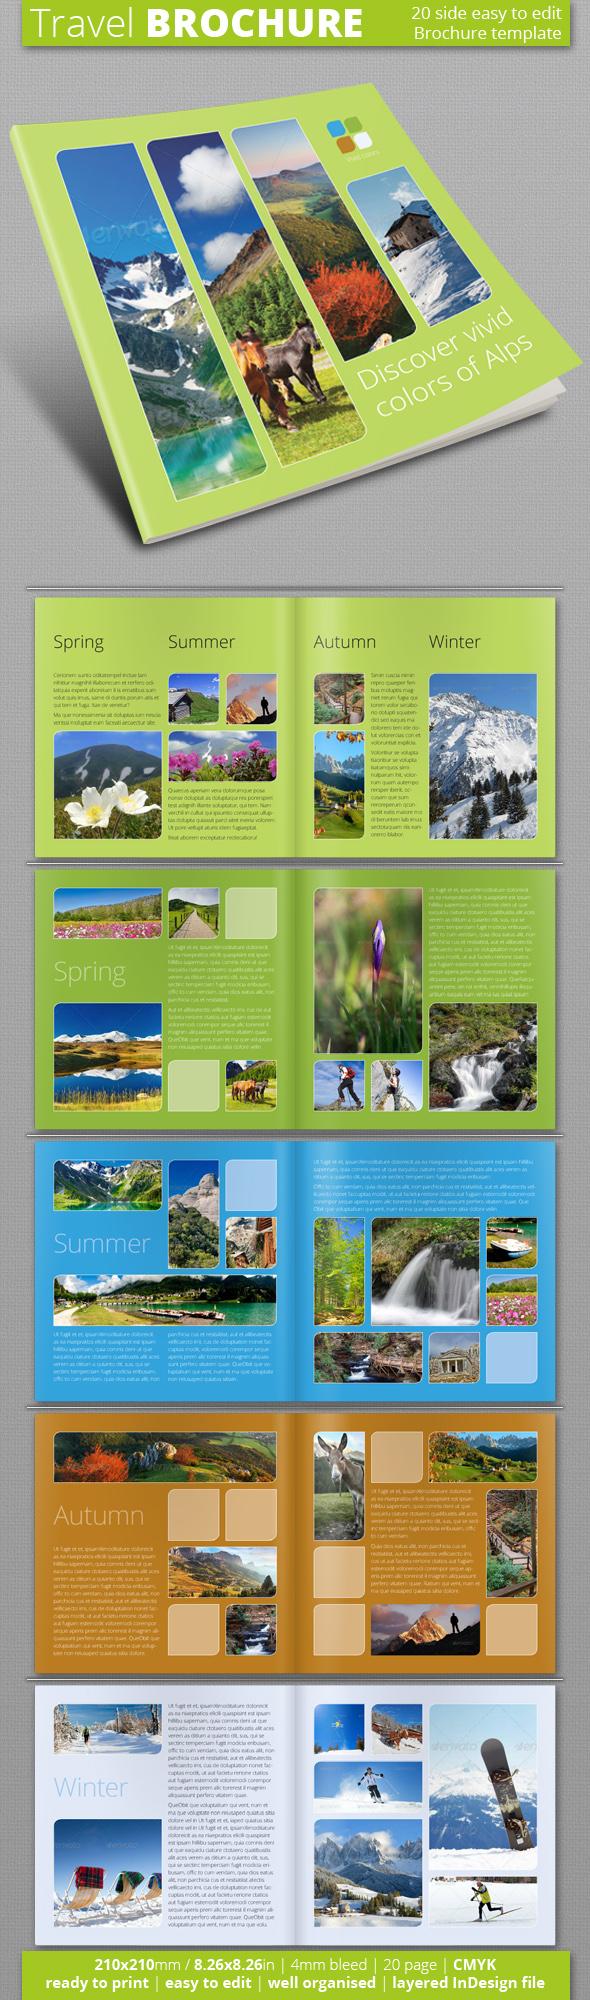 Travel Brochure Travel Brochure Brochure Template And Brochures - Information brochure template